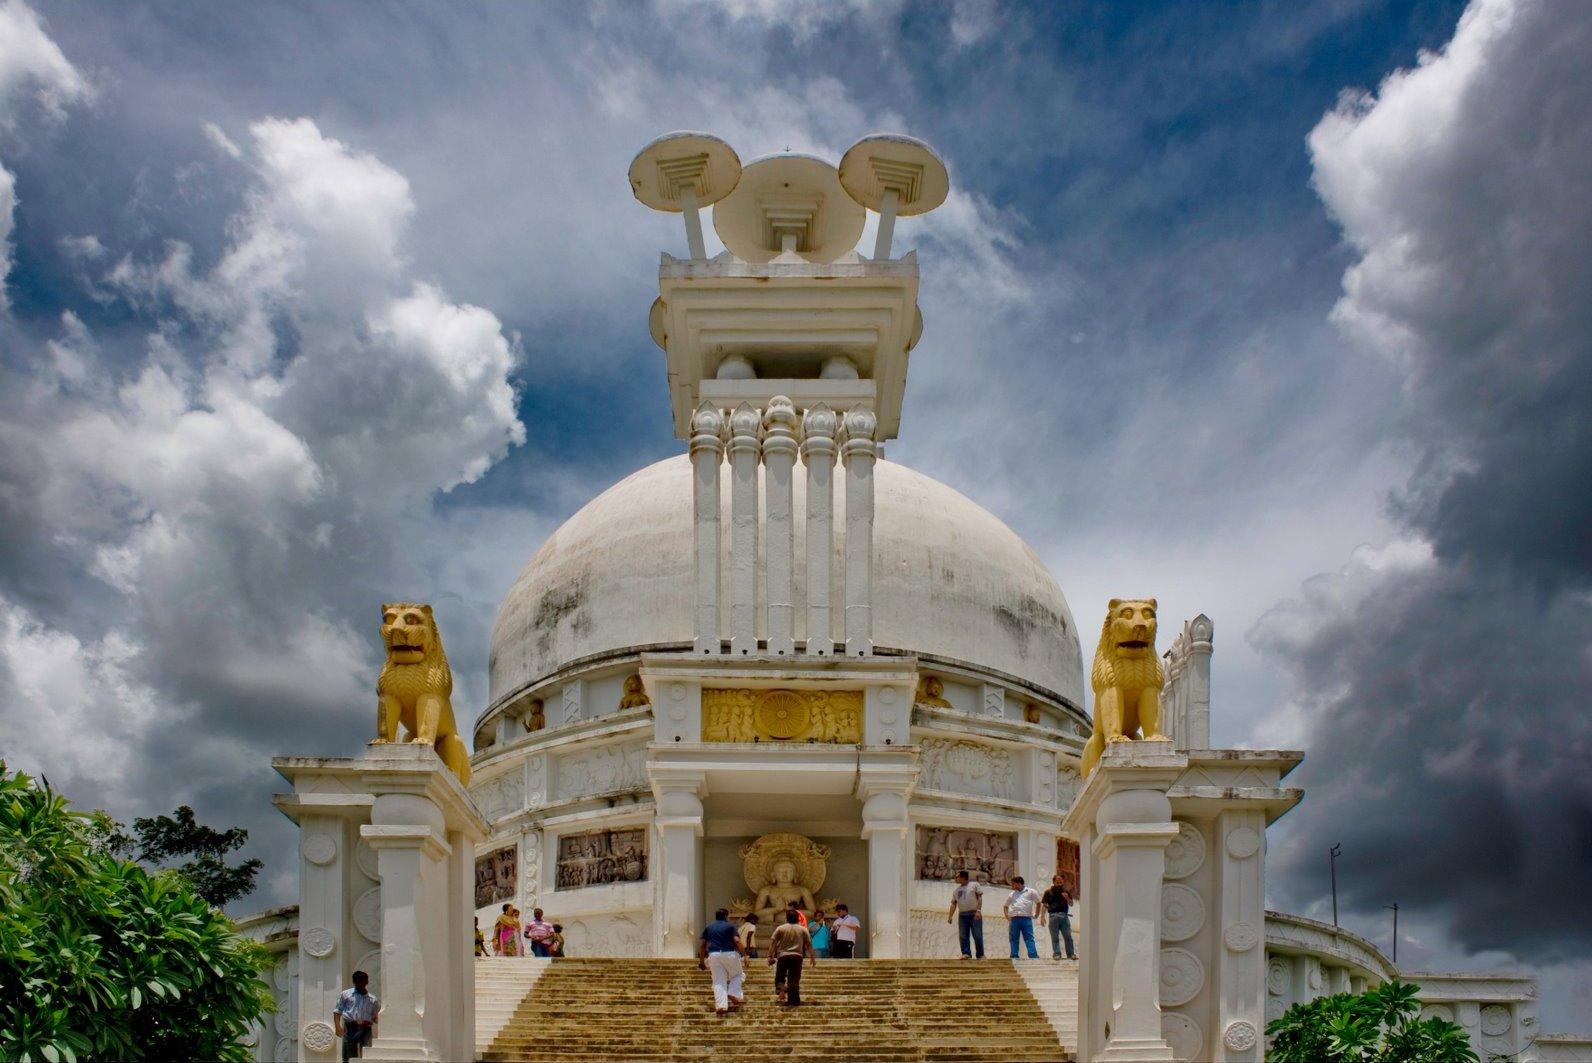 http://upload.wikimedia.org/wikipedia/commons/d/d6/Dhauli-Giri-Shanti-Stupa-Bhubaneswar-Orissa.jpg